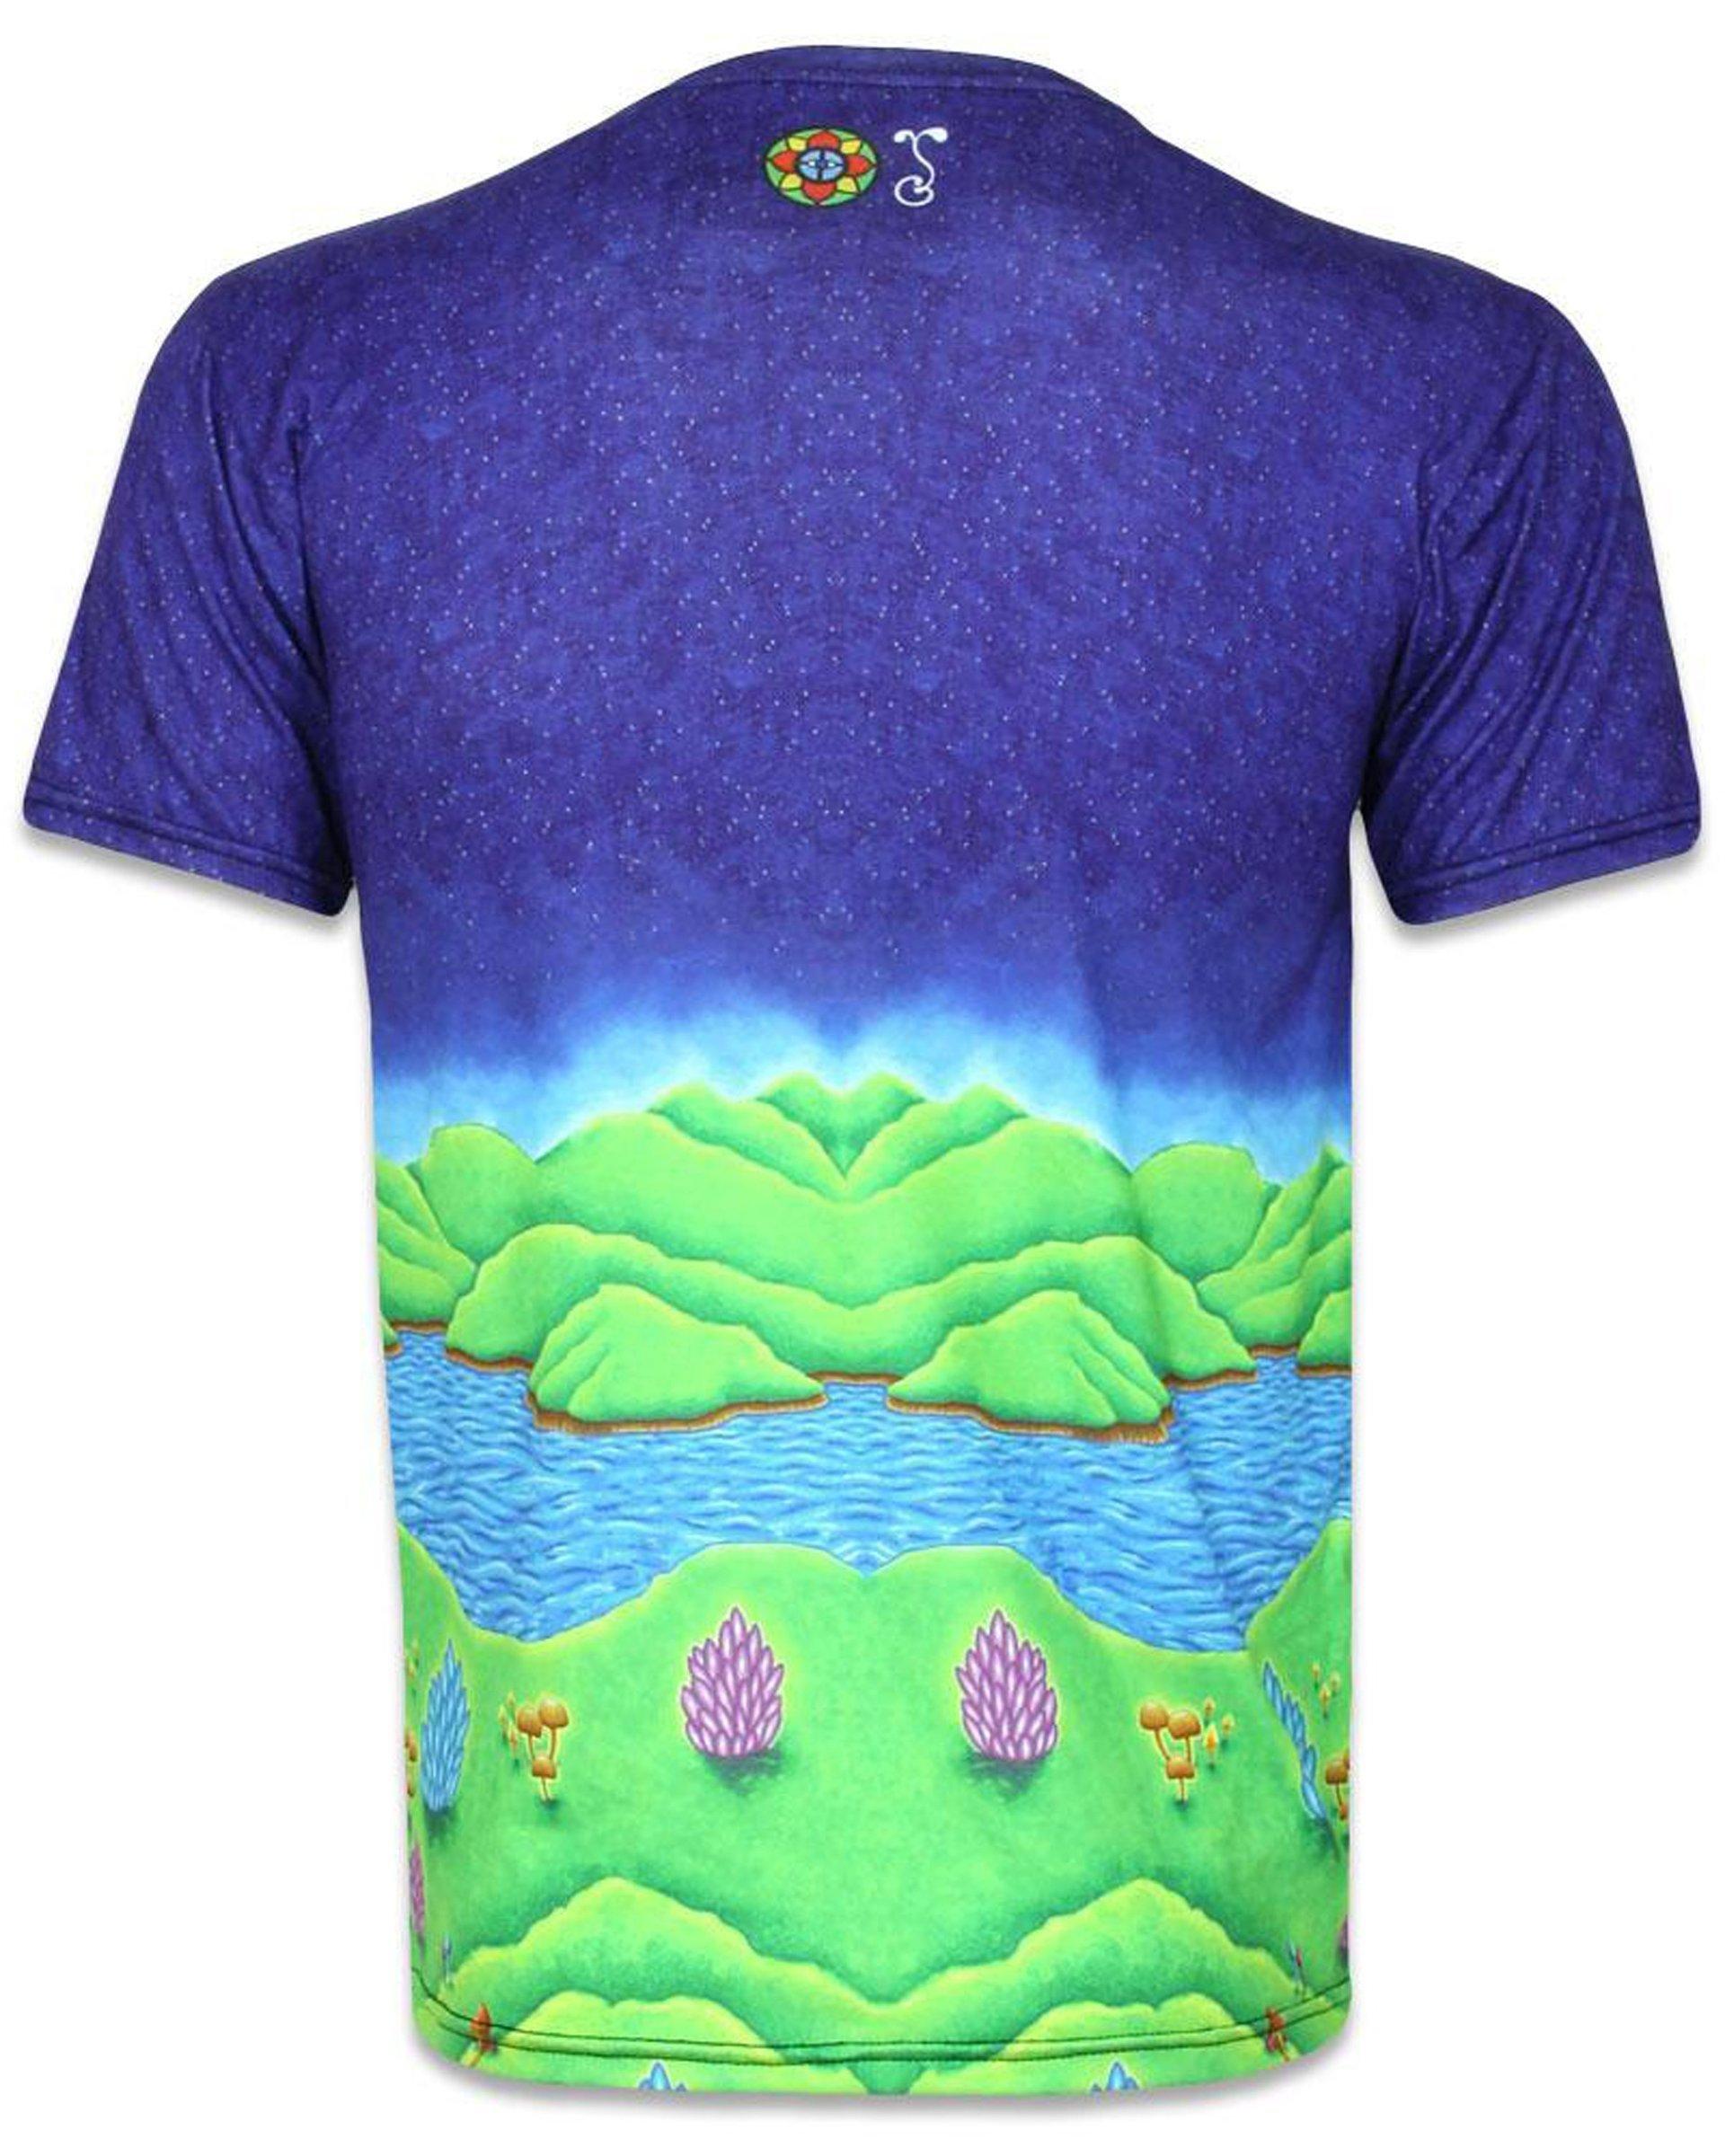 Muncher of Mushroomland Short Sleeve Men's T-Shirt (Back)